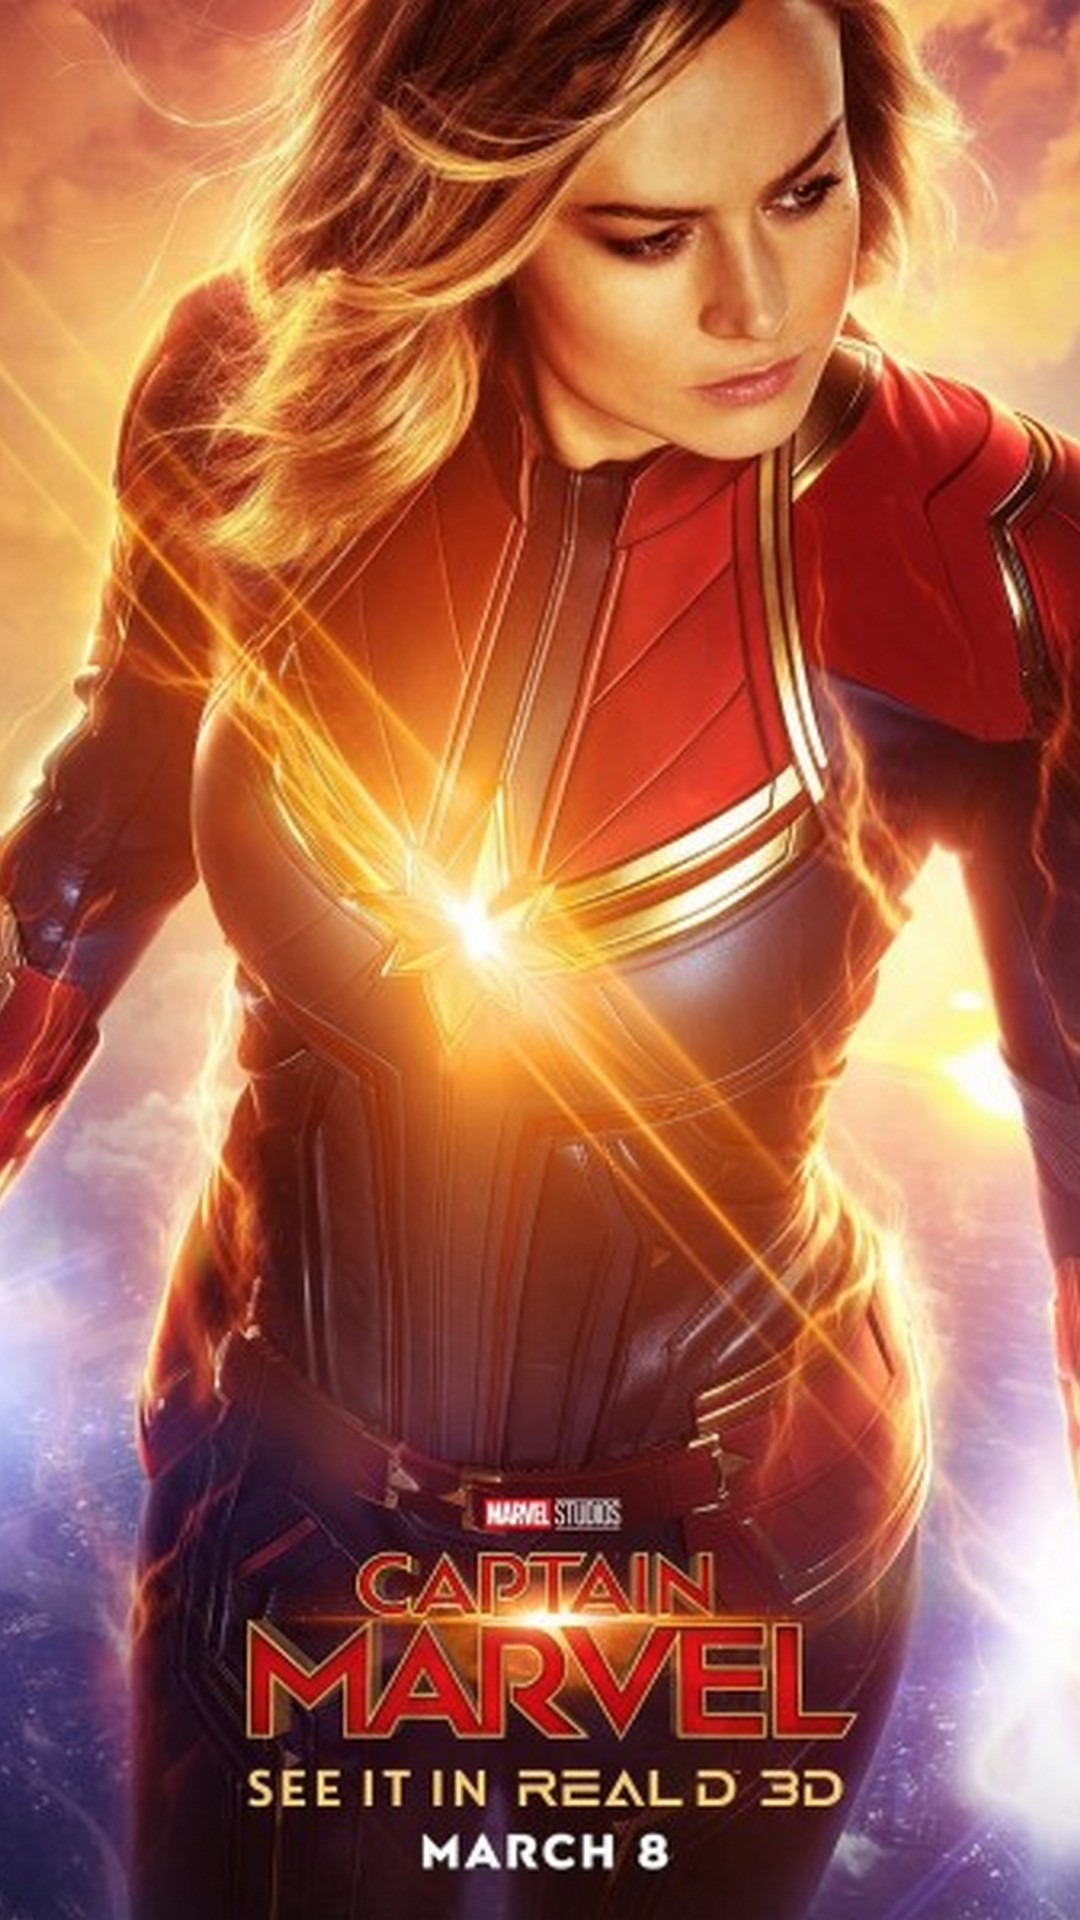 32] Captain Marvel Phone Wallpapers on WallpaperSafari 1080x1920